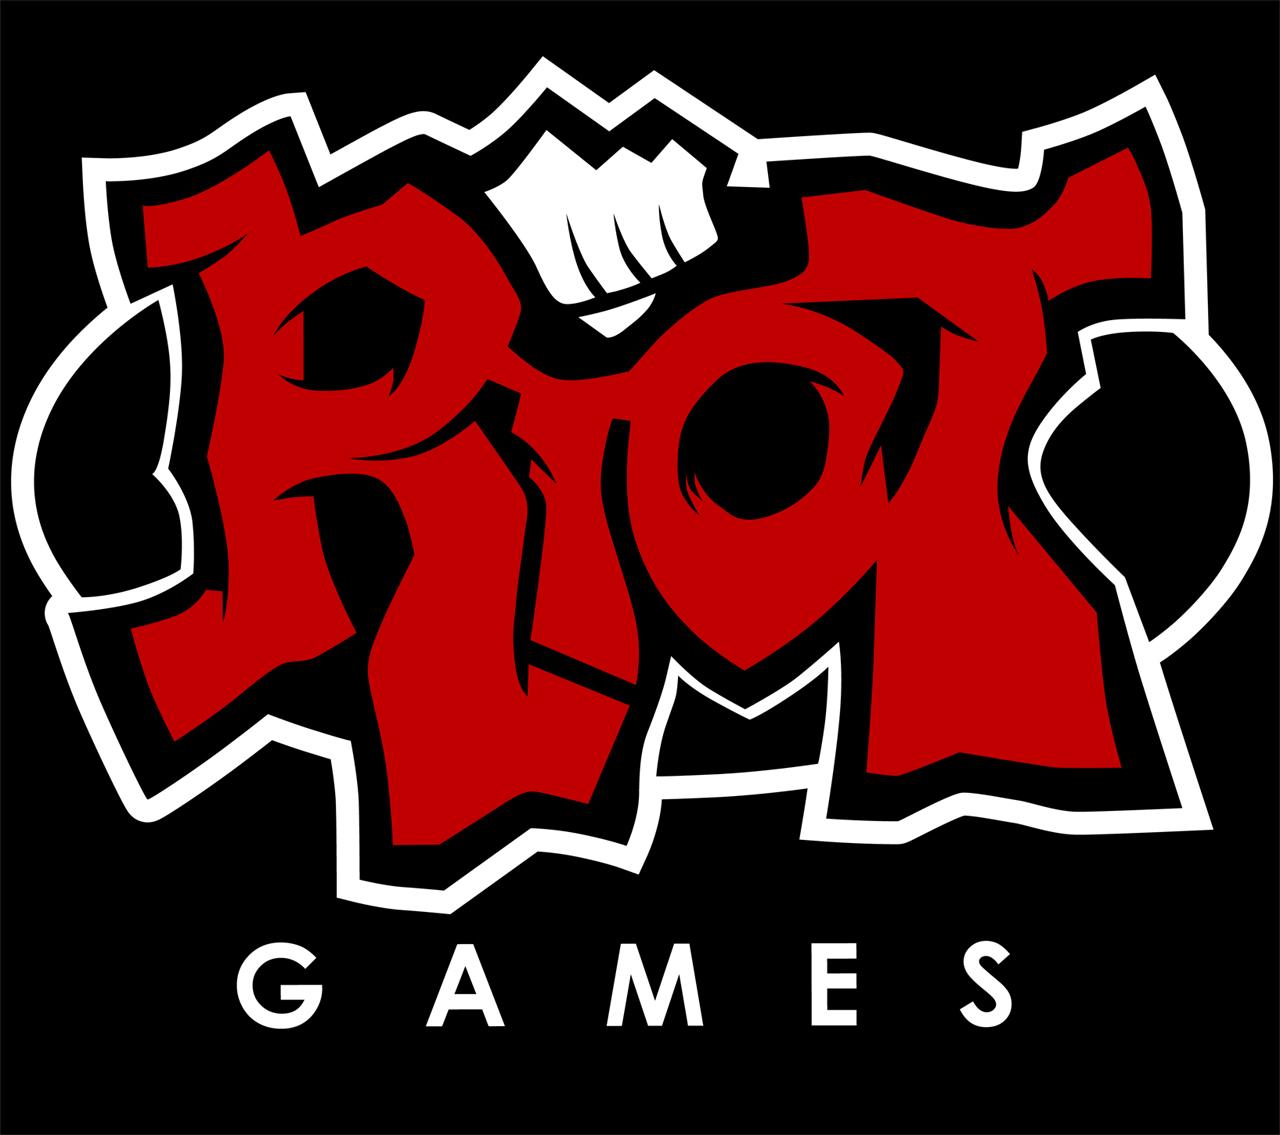 Games: Riot Games